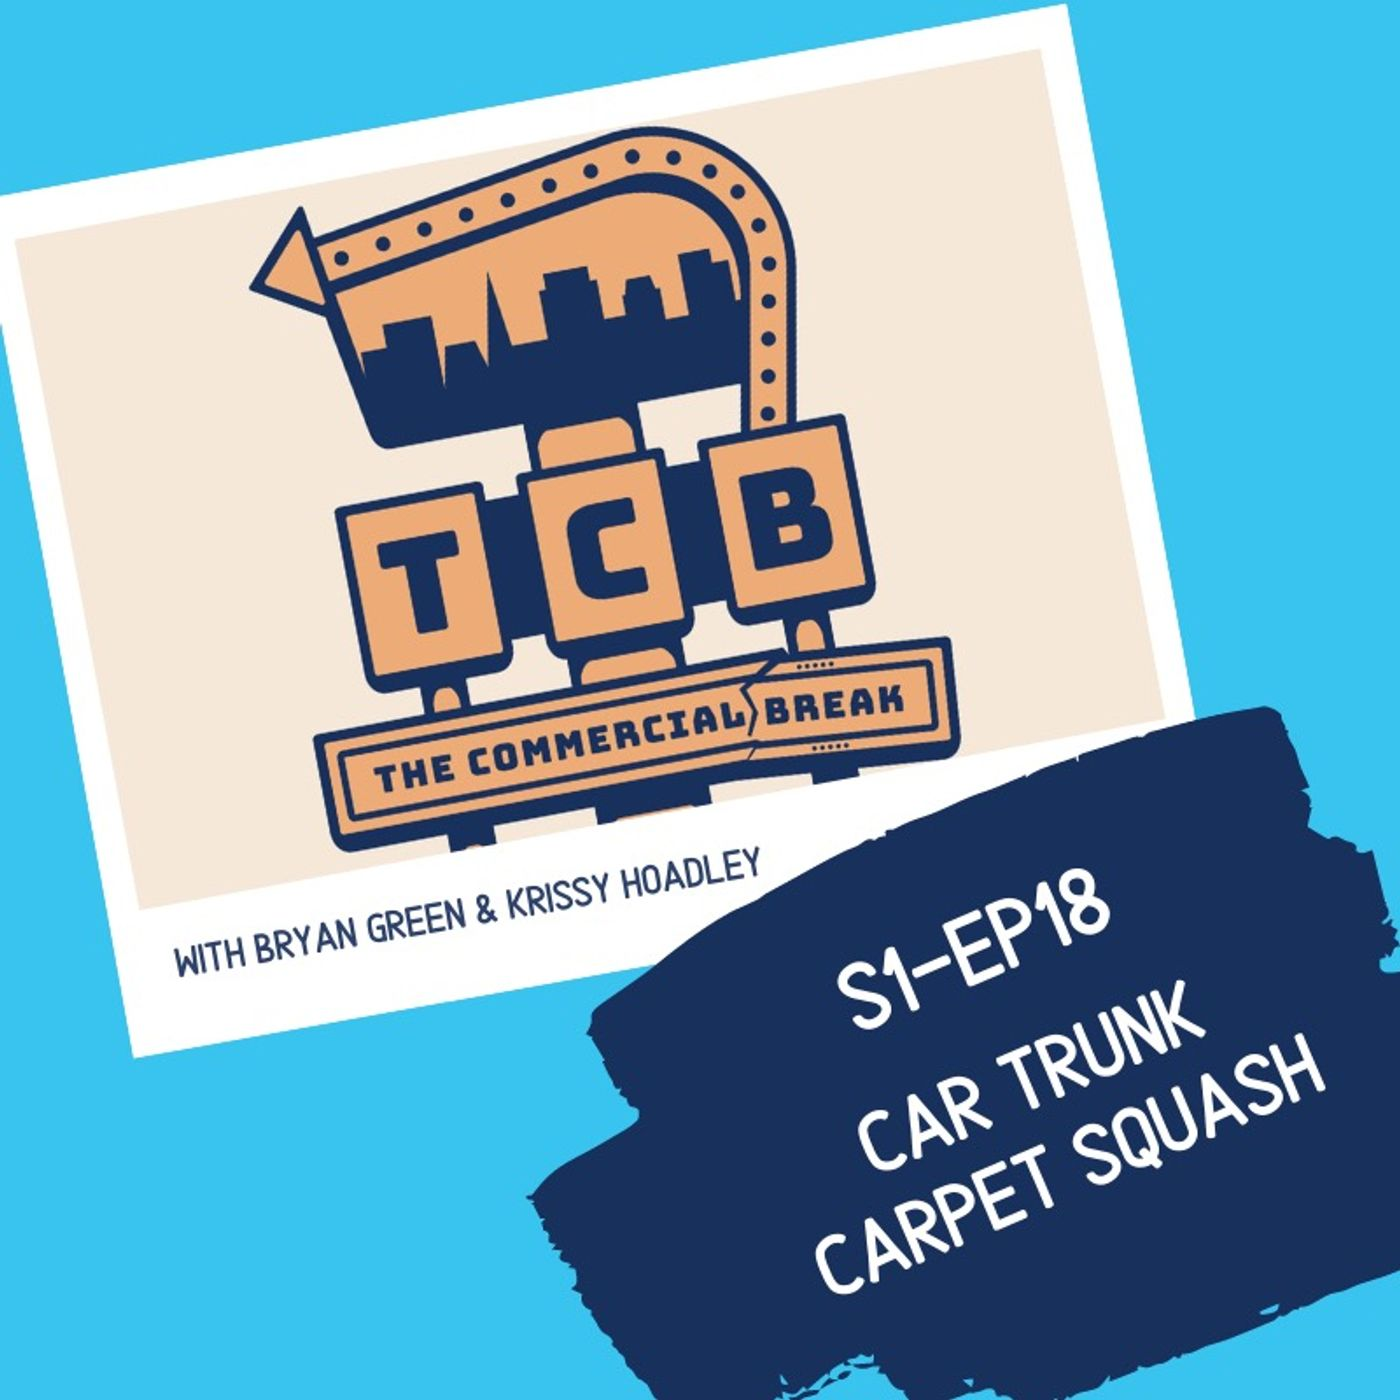 S1-EP18: Car Trunk Carpet Squash